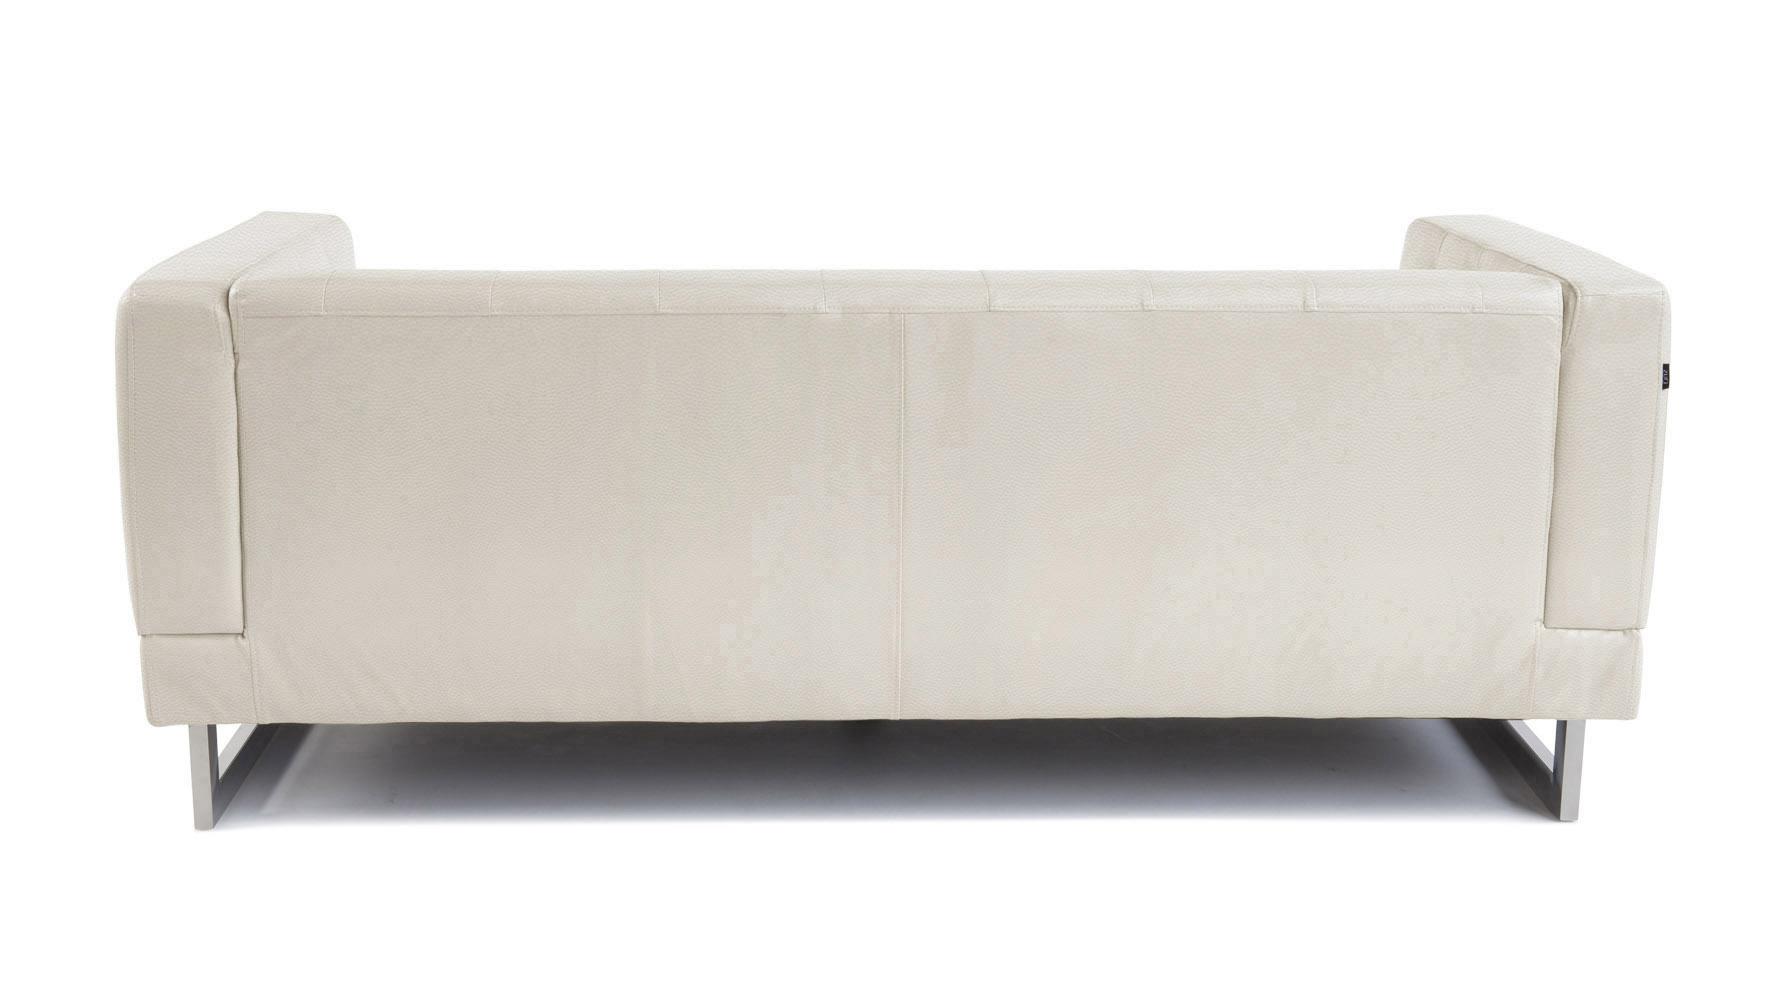 Cream Zeta Tufted Sofa Set With Armchairs Zuri Furniture ~ Cream Leather Tufted Sofa